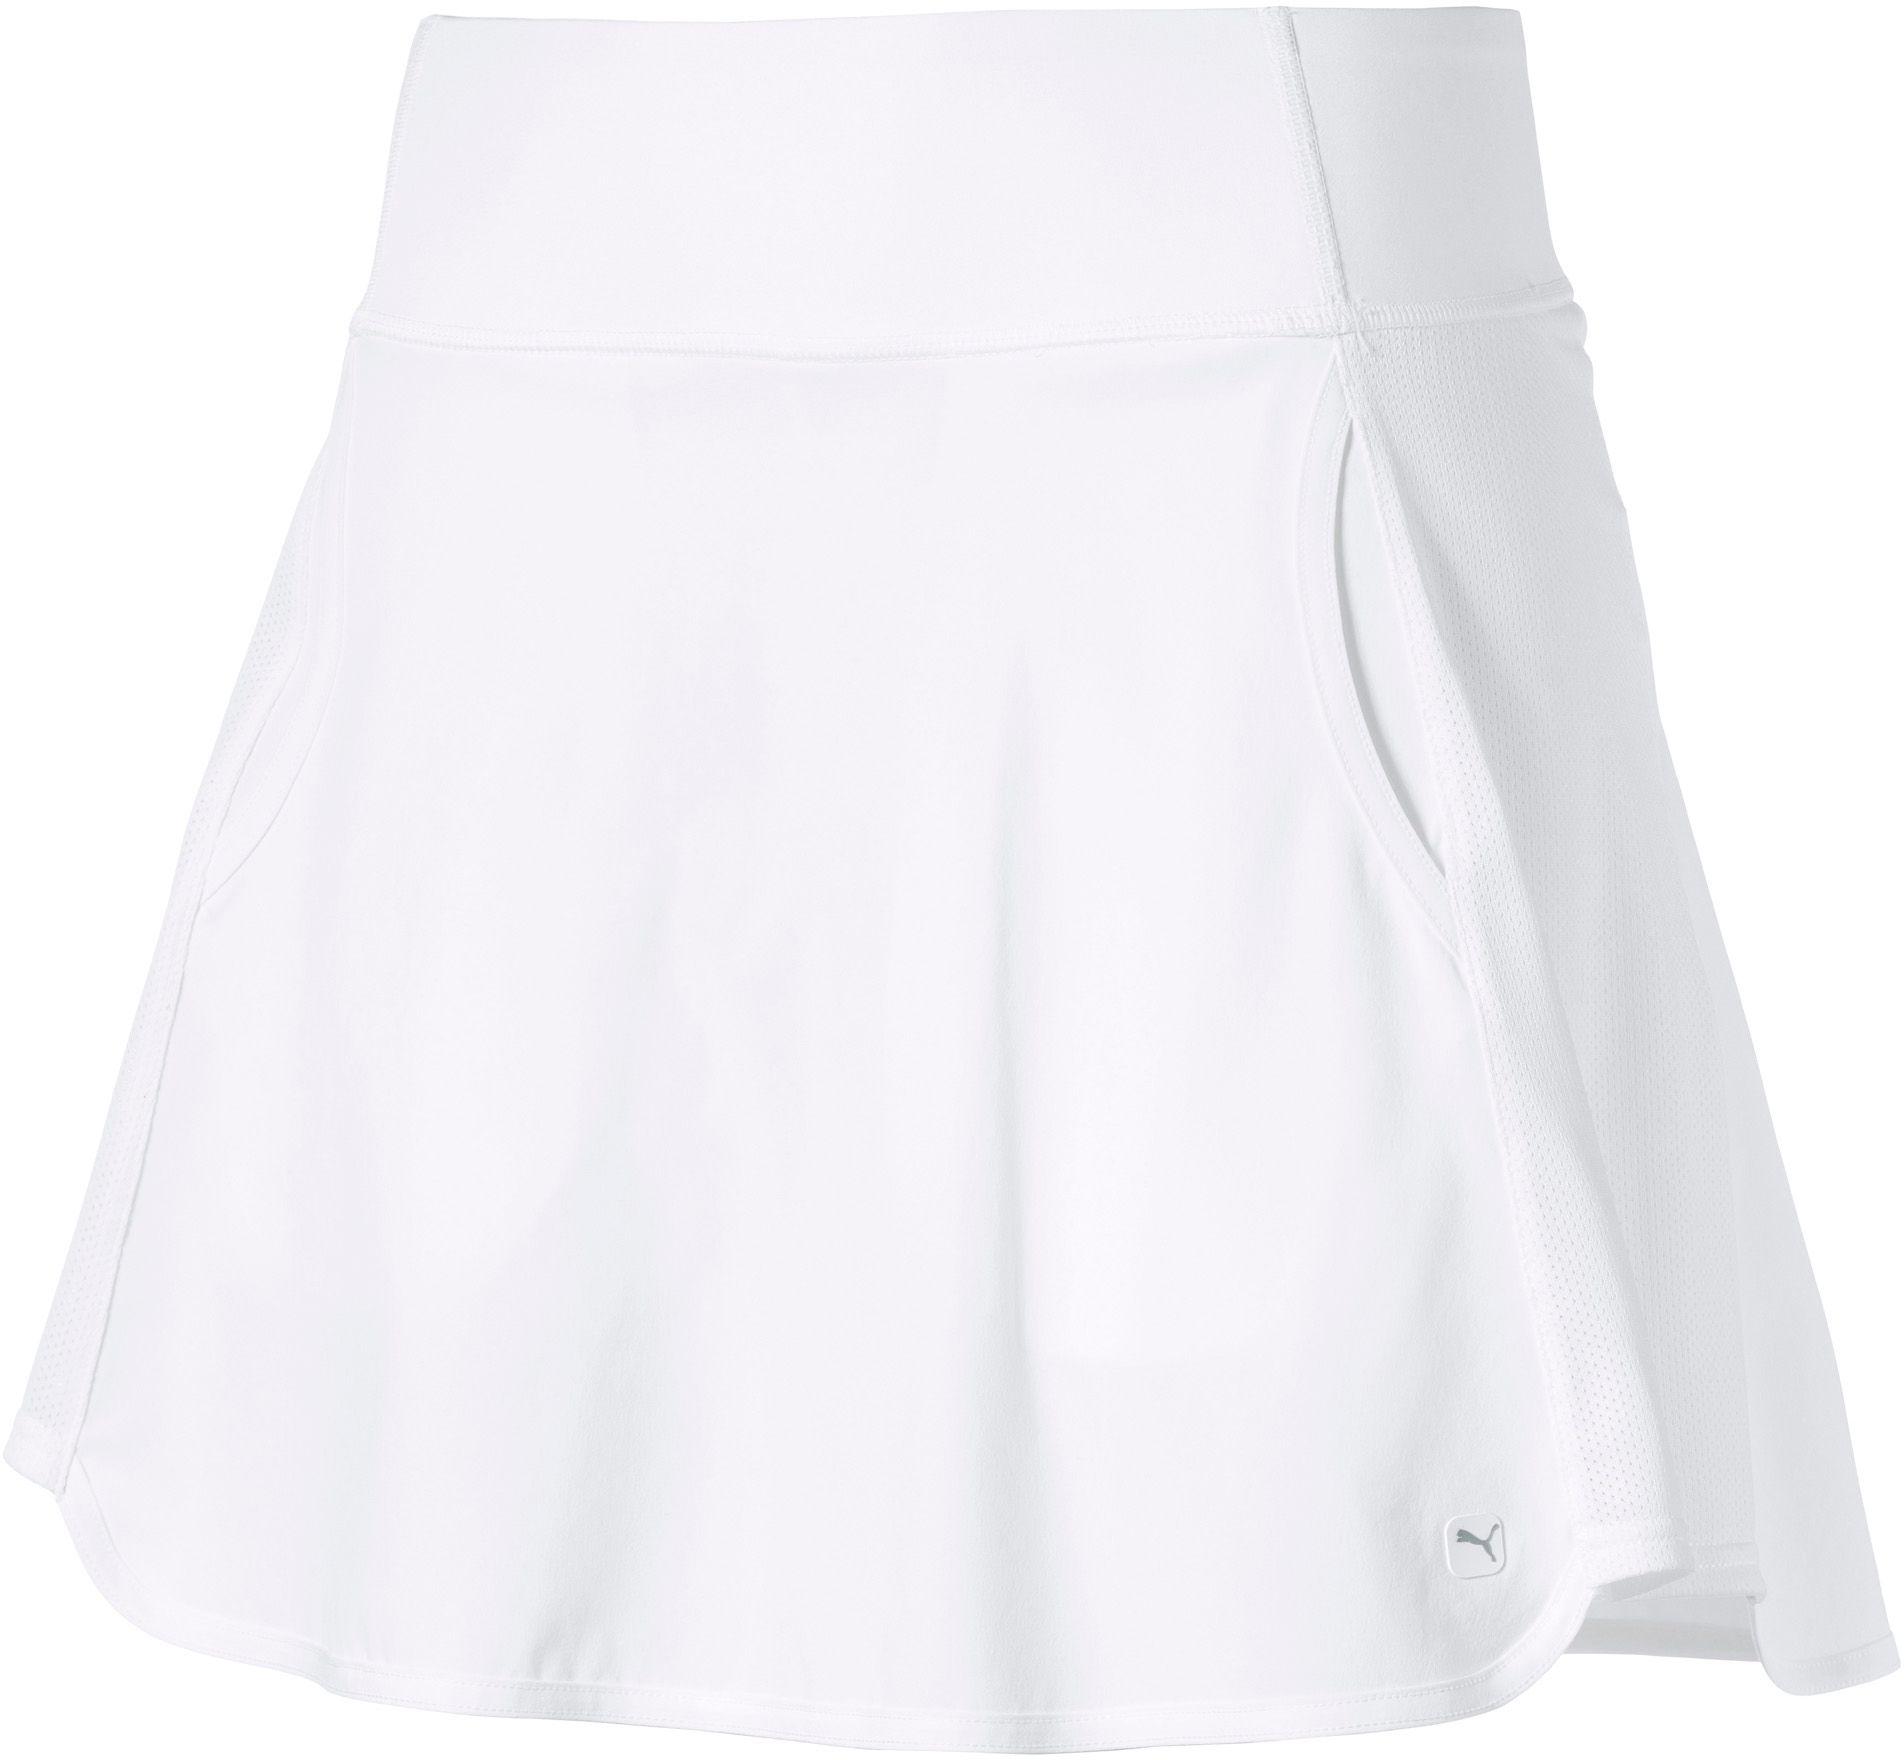 Women's Fashion PWRSHAPE 16''-18'' Golf Skort, XL LONG, Bright White